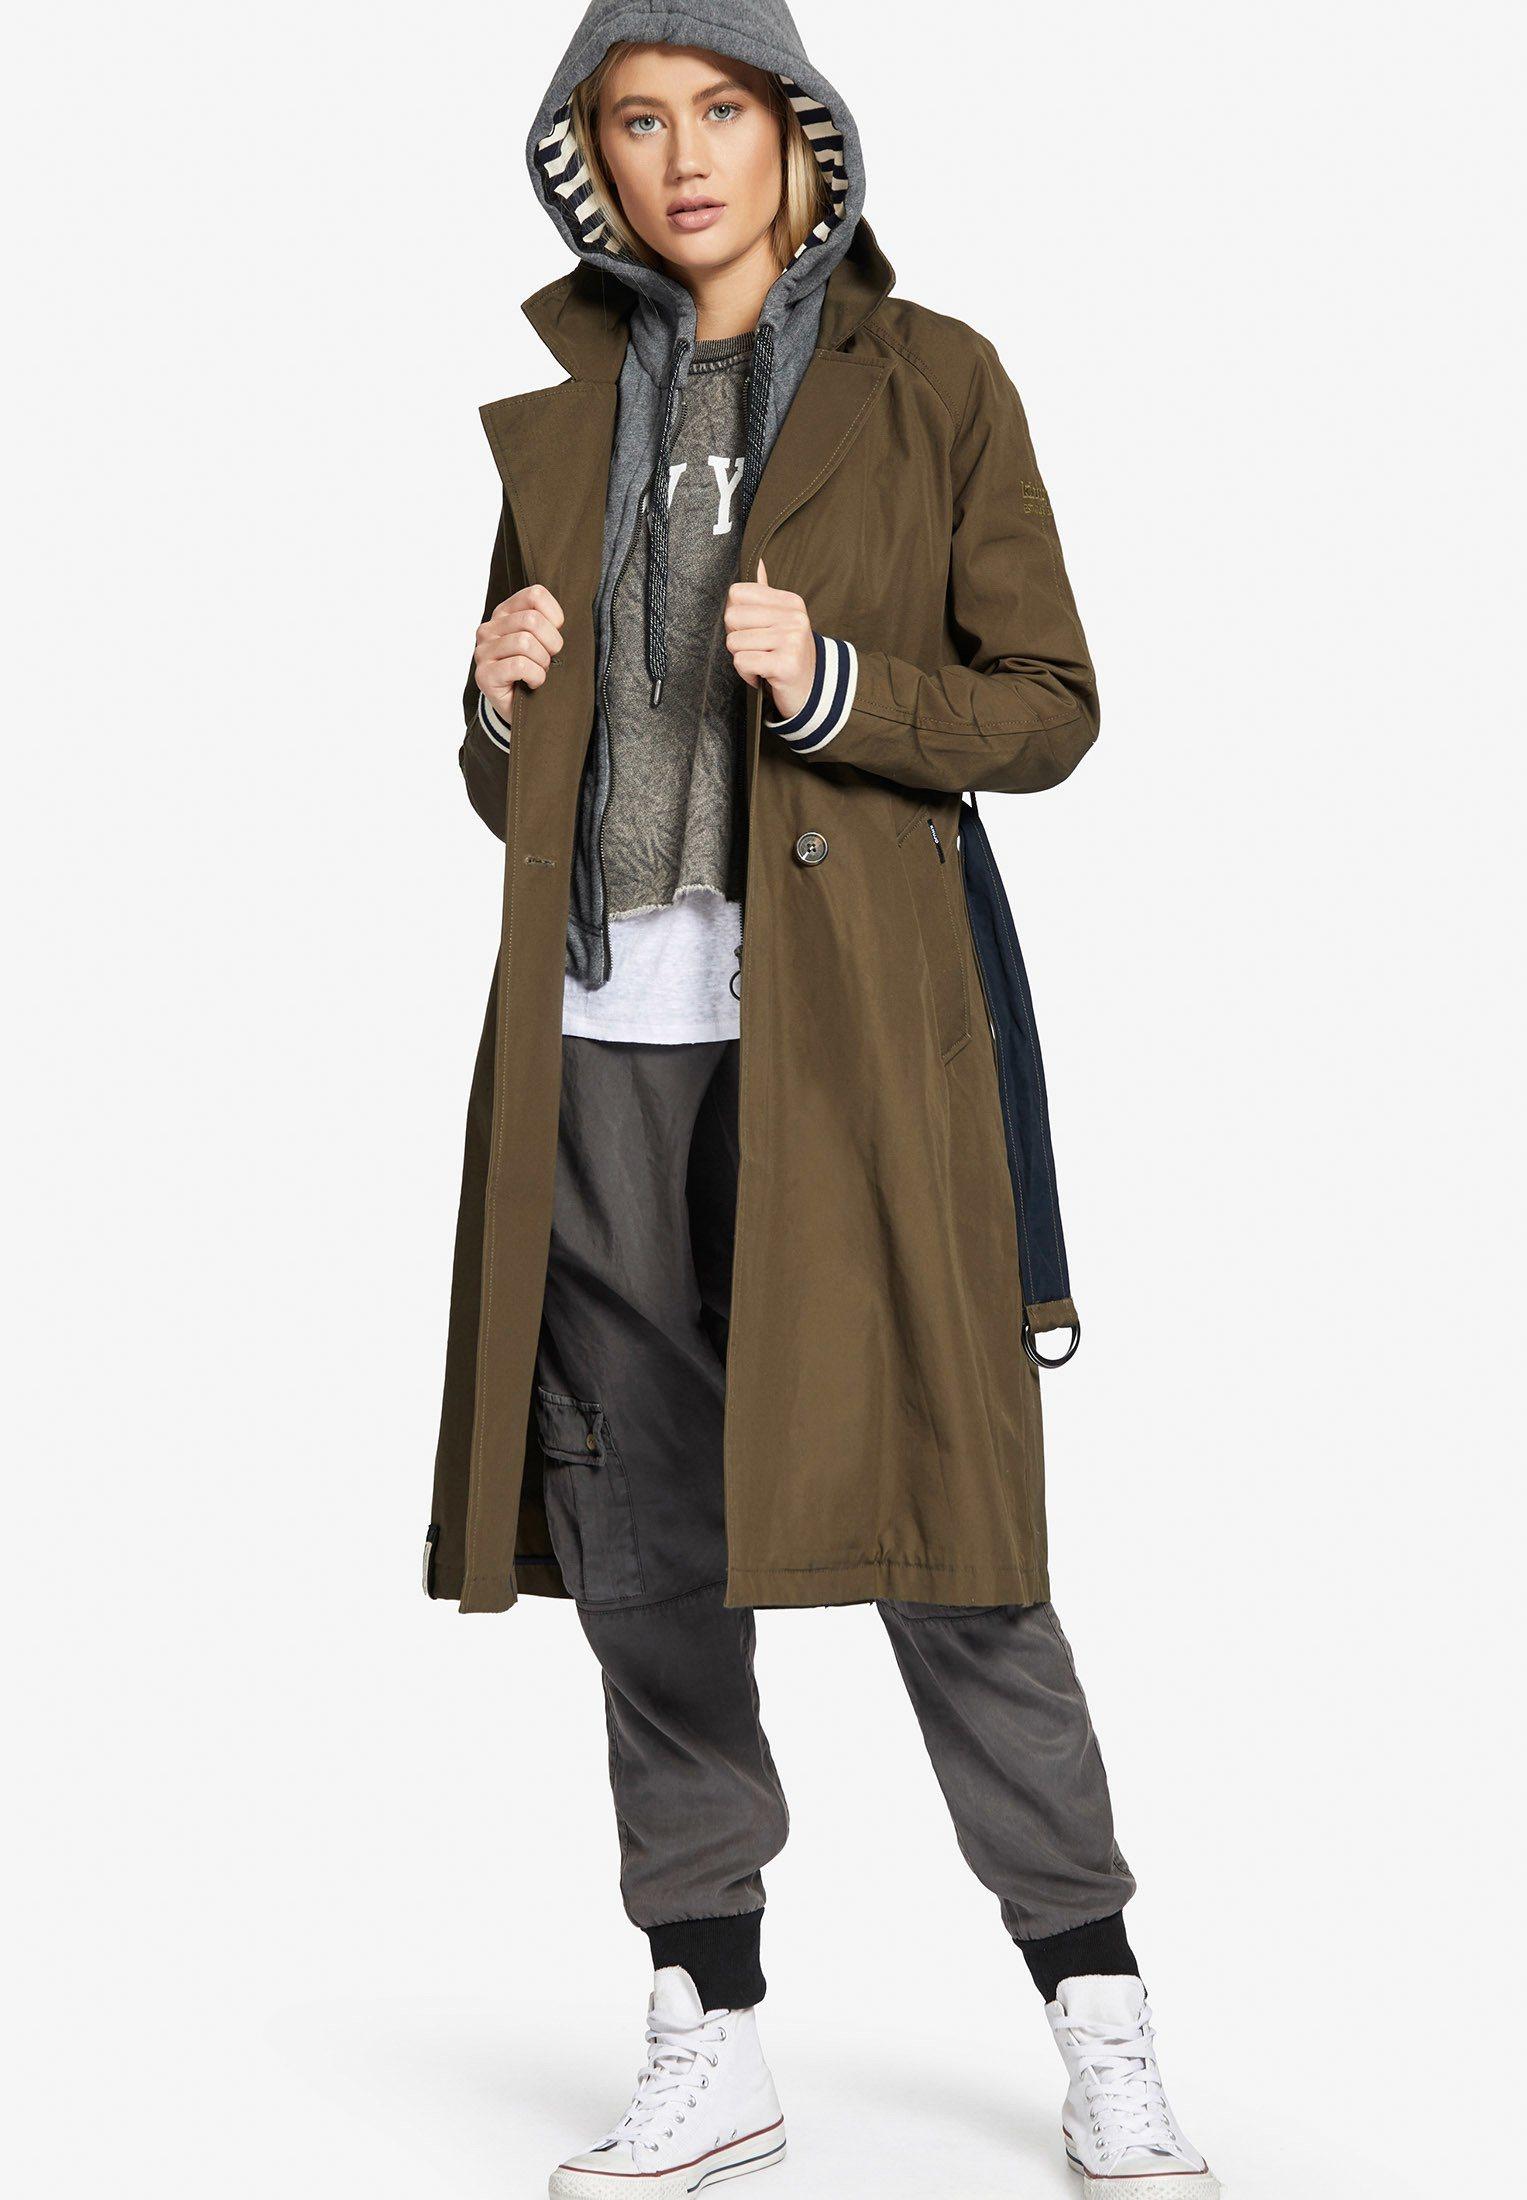 khujo Trenchcoat »JUDITA WITH INNER JACKET«, mit herausnehmbaren Kapuzeneinsatz   Bekleidung > Mäntel > Trenchcoats   khujo